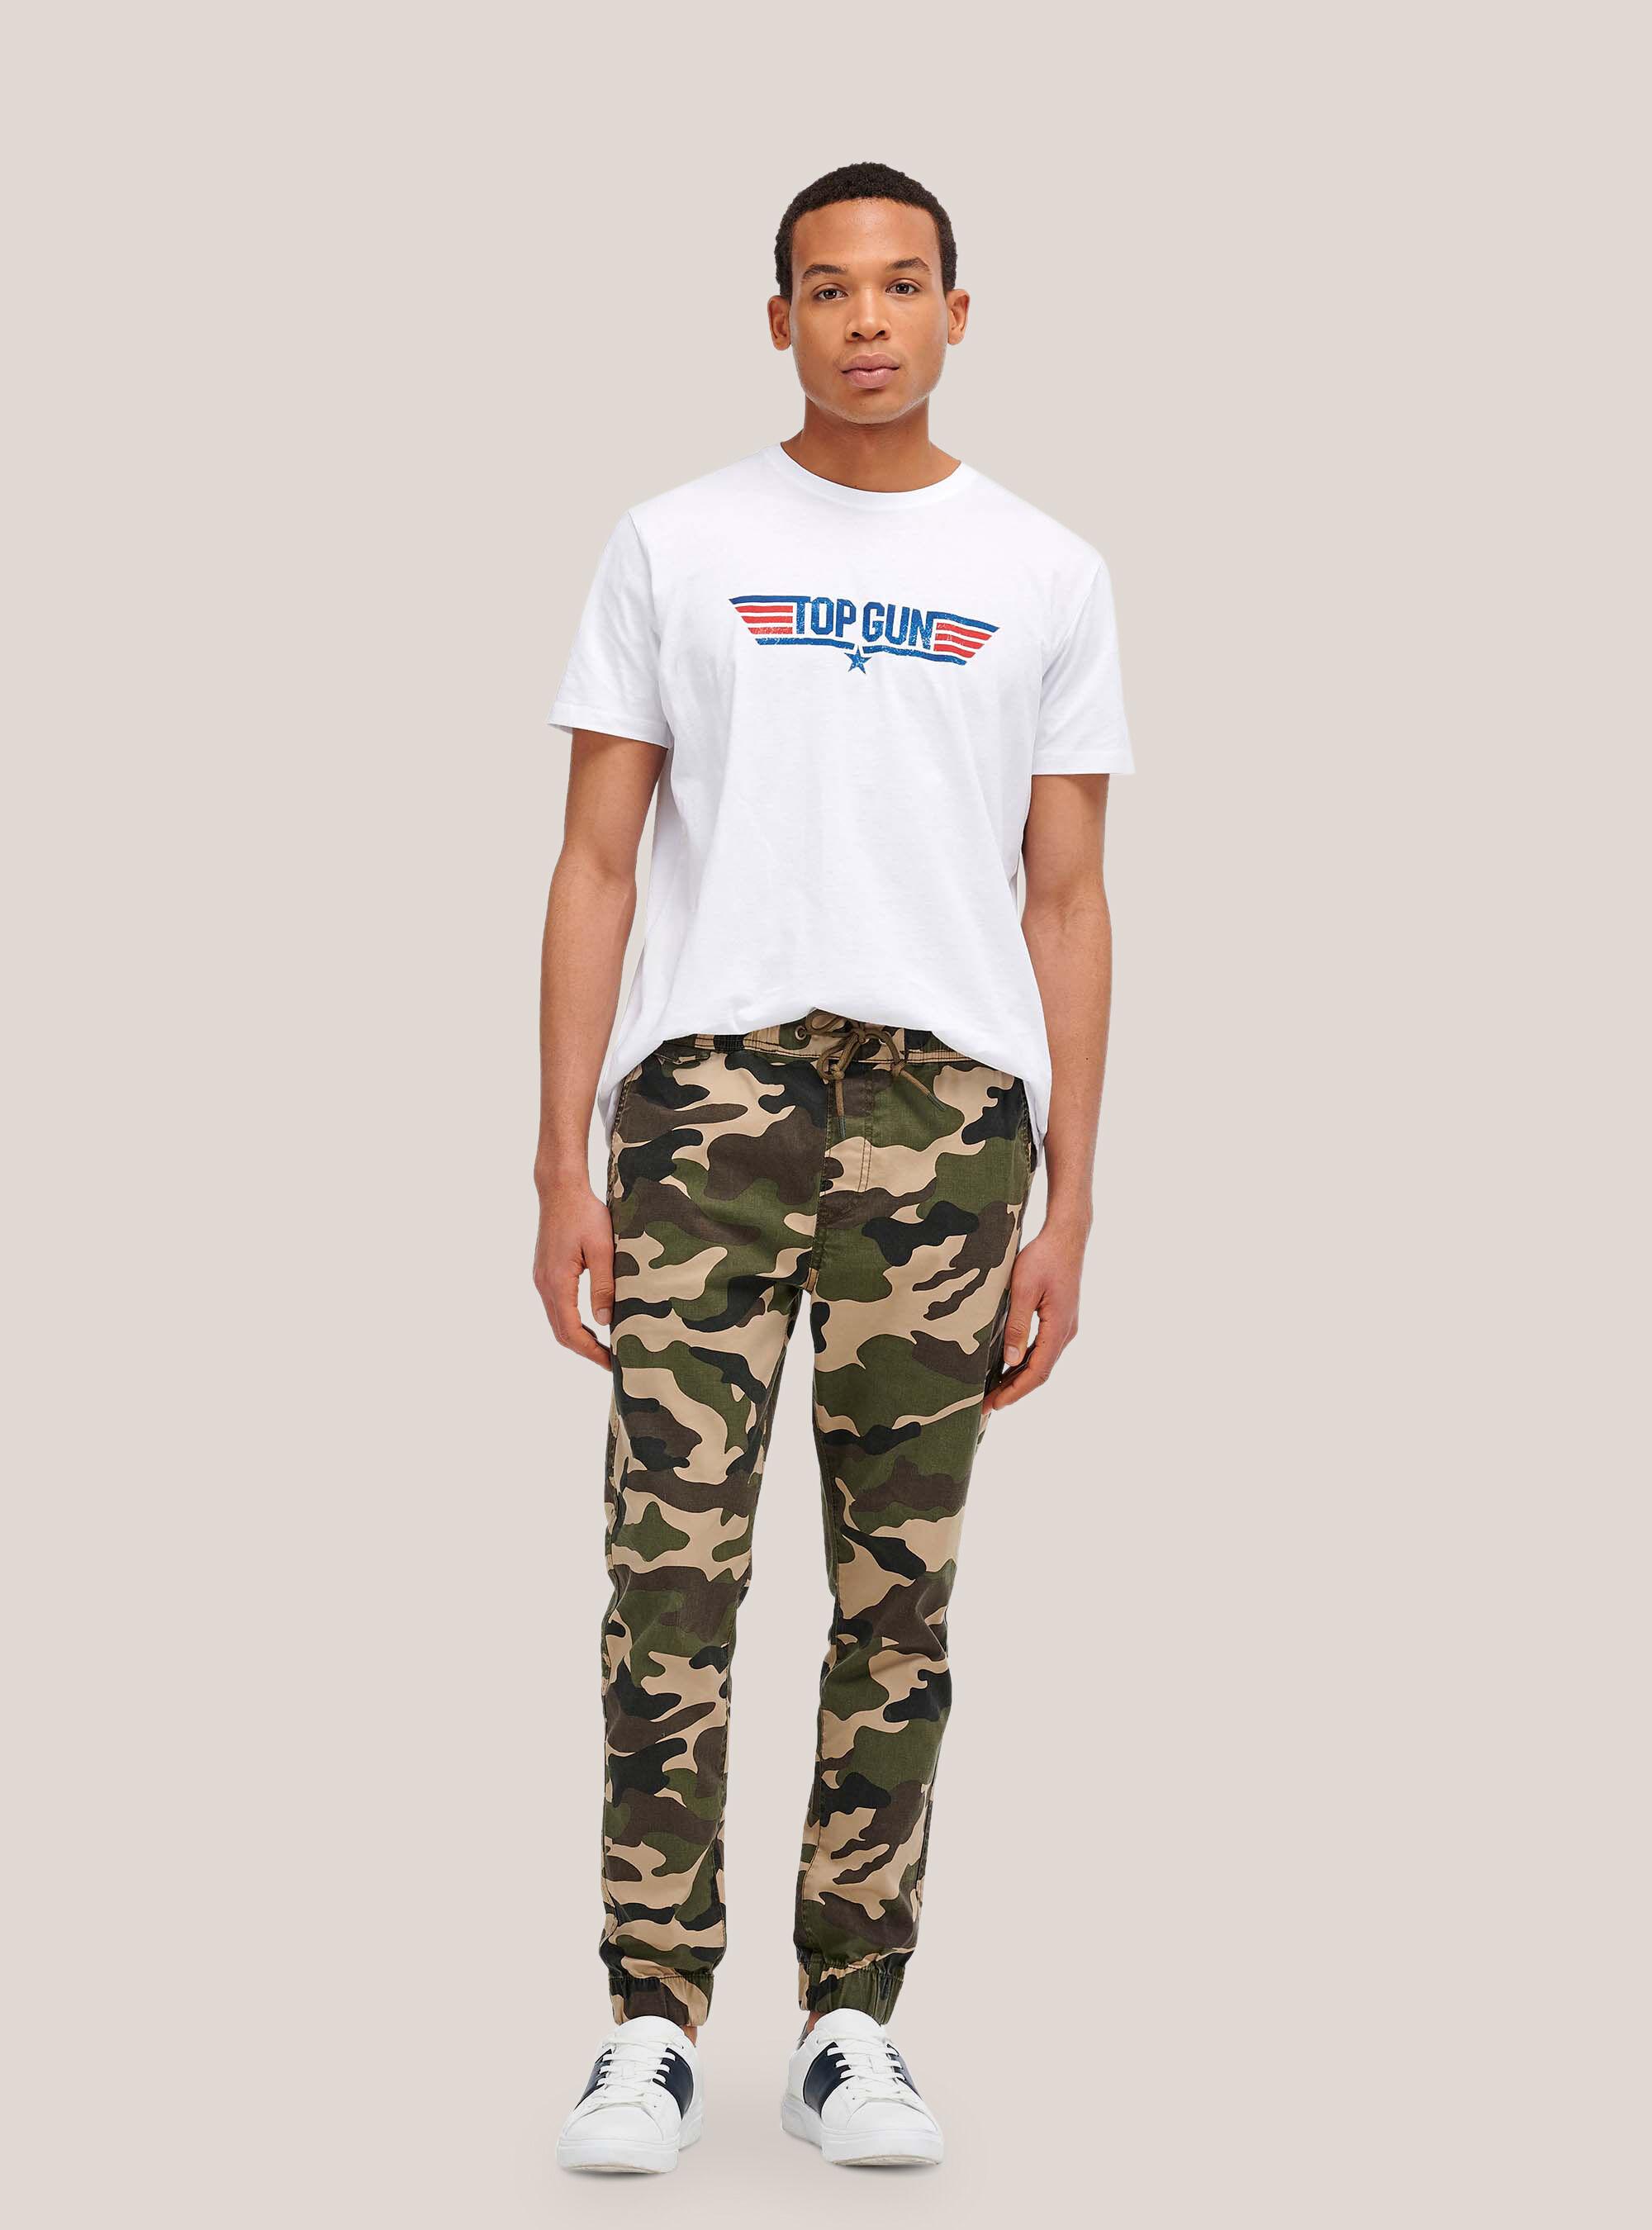 Tipi di pantaloni uomo | Zalando Privé